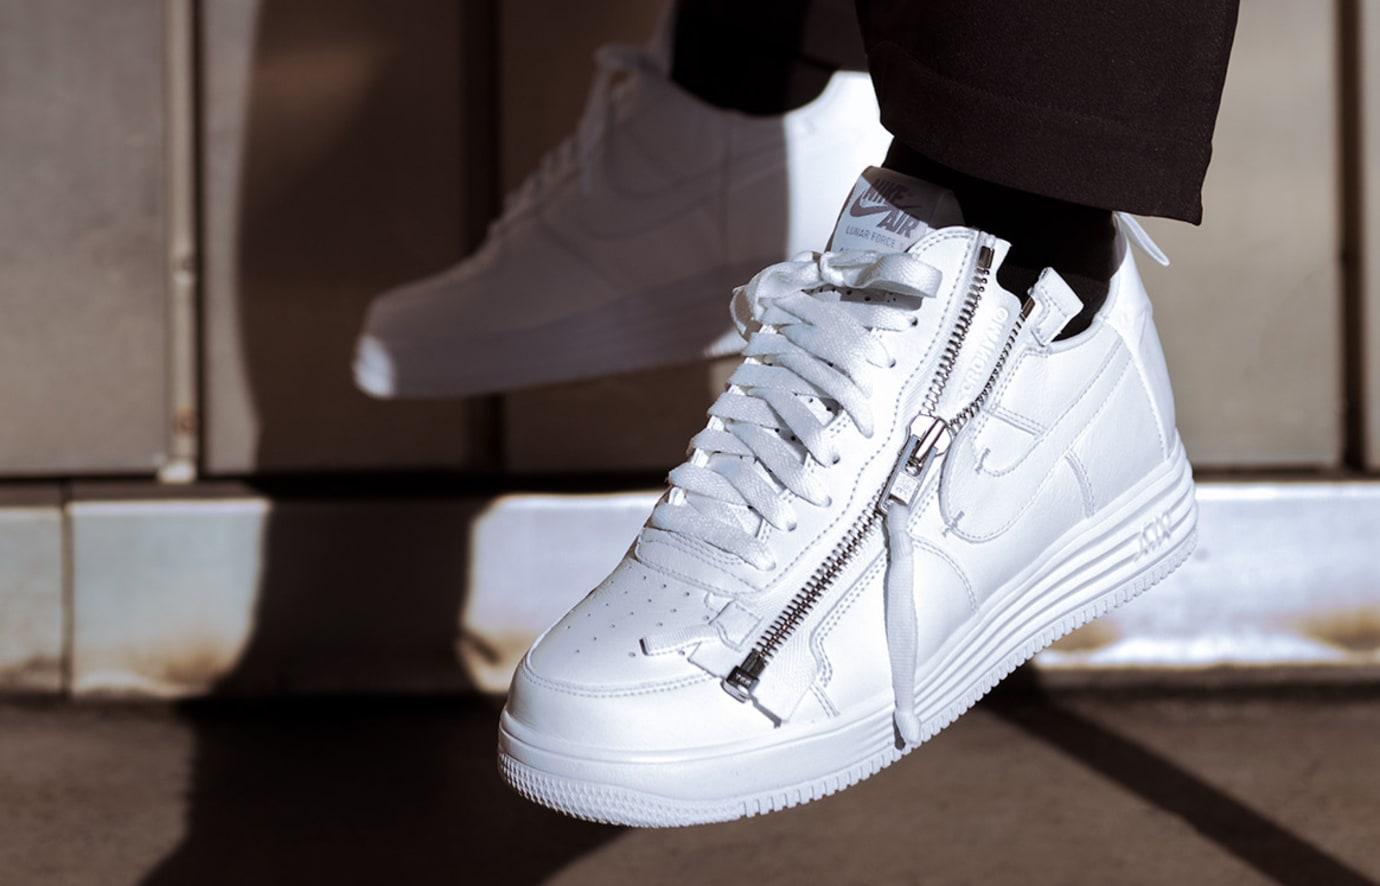 Nike Air Force 1 Roc A Fella Acronym Off White Travis Scott Don C ...